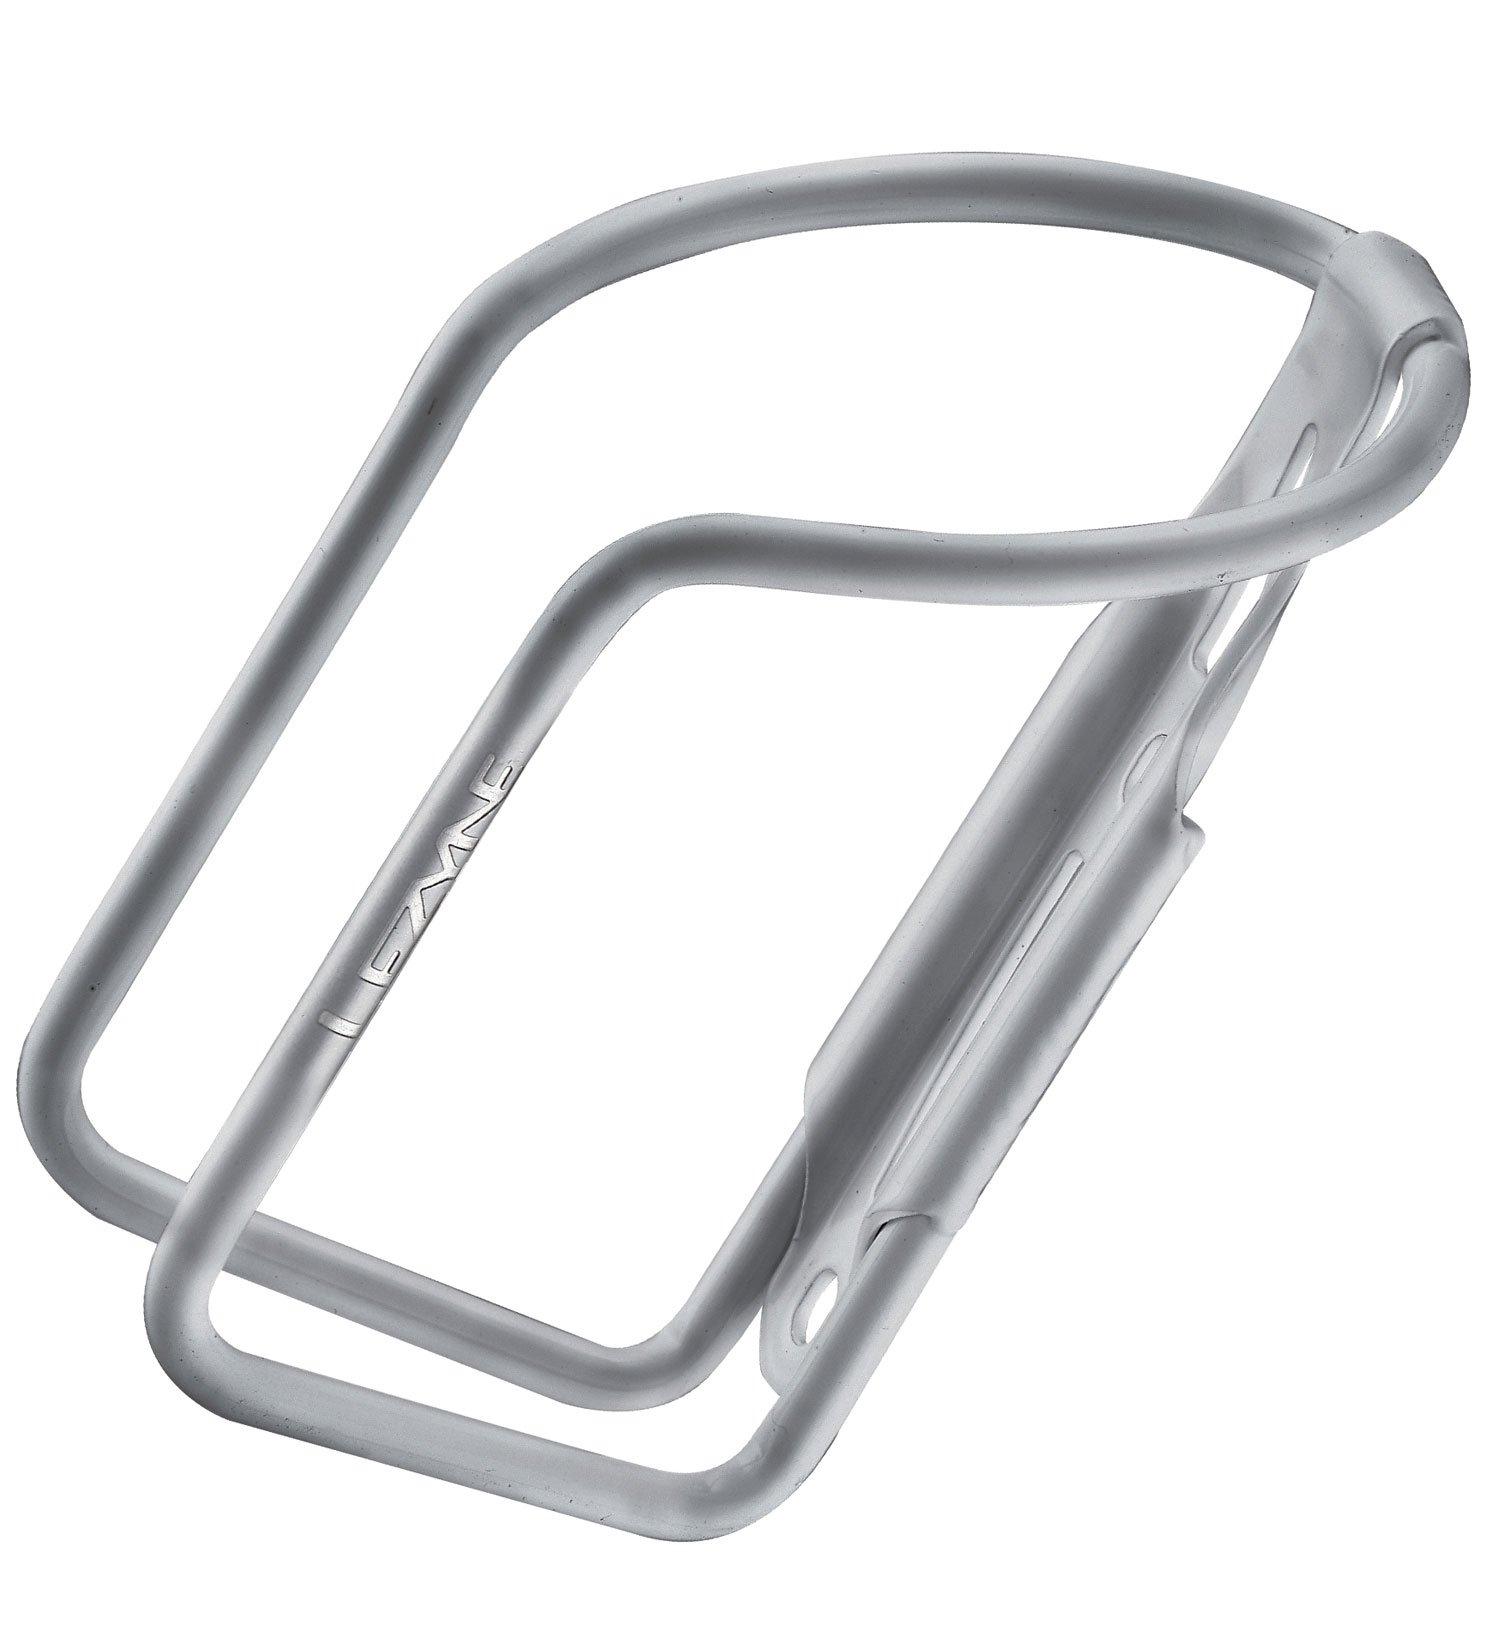 Lezyne Power aluminiumsflaskeholder sølv